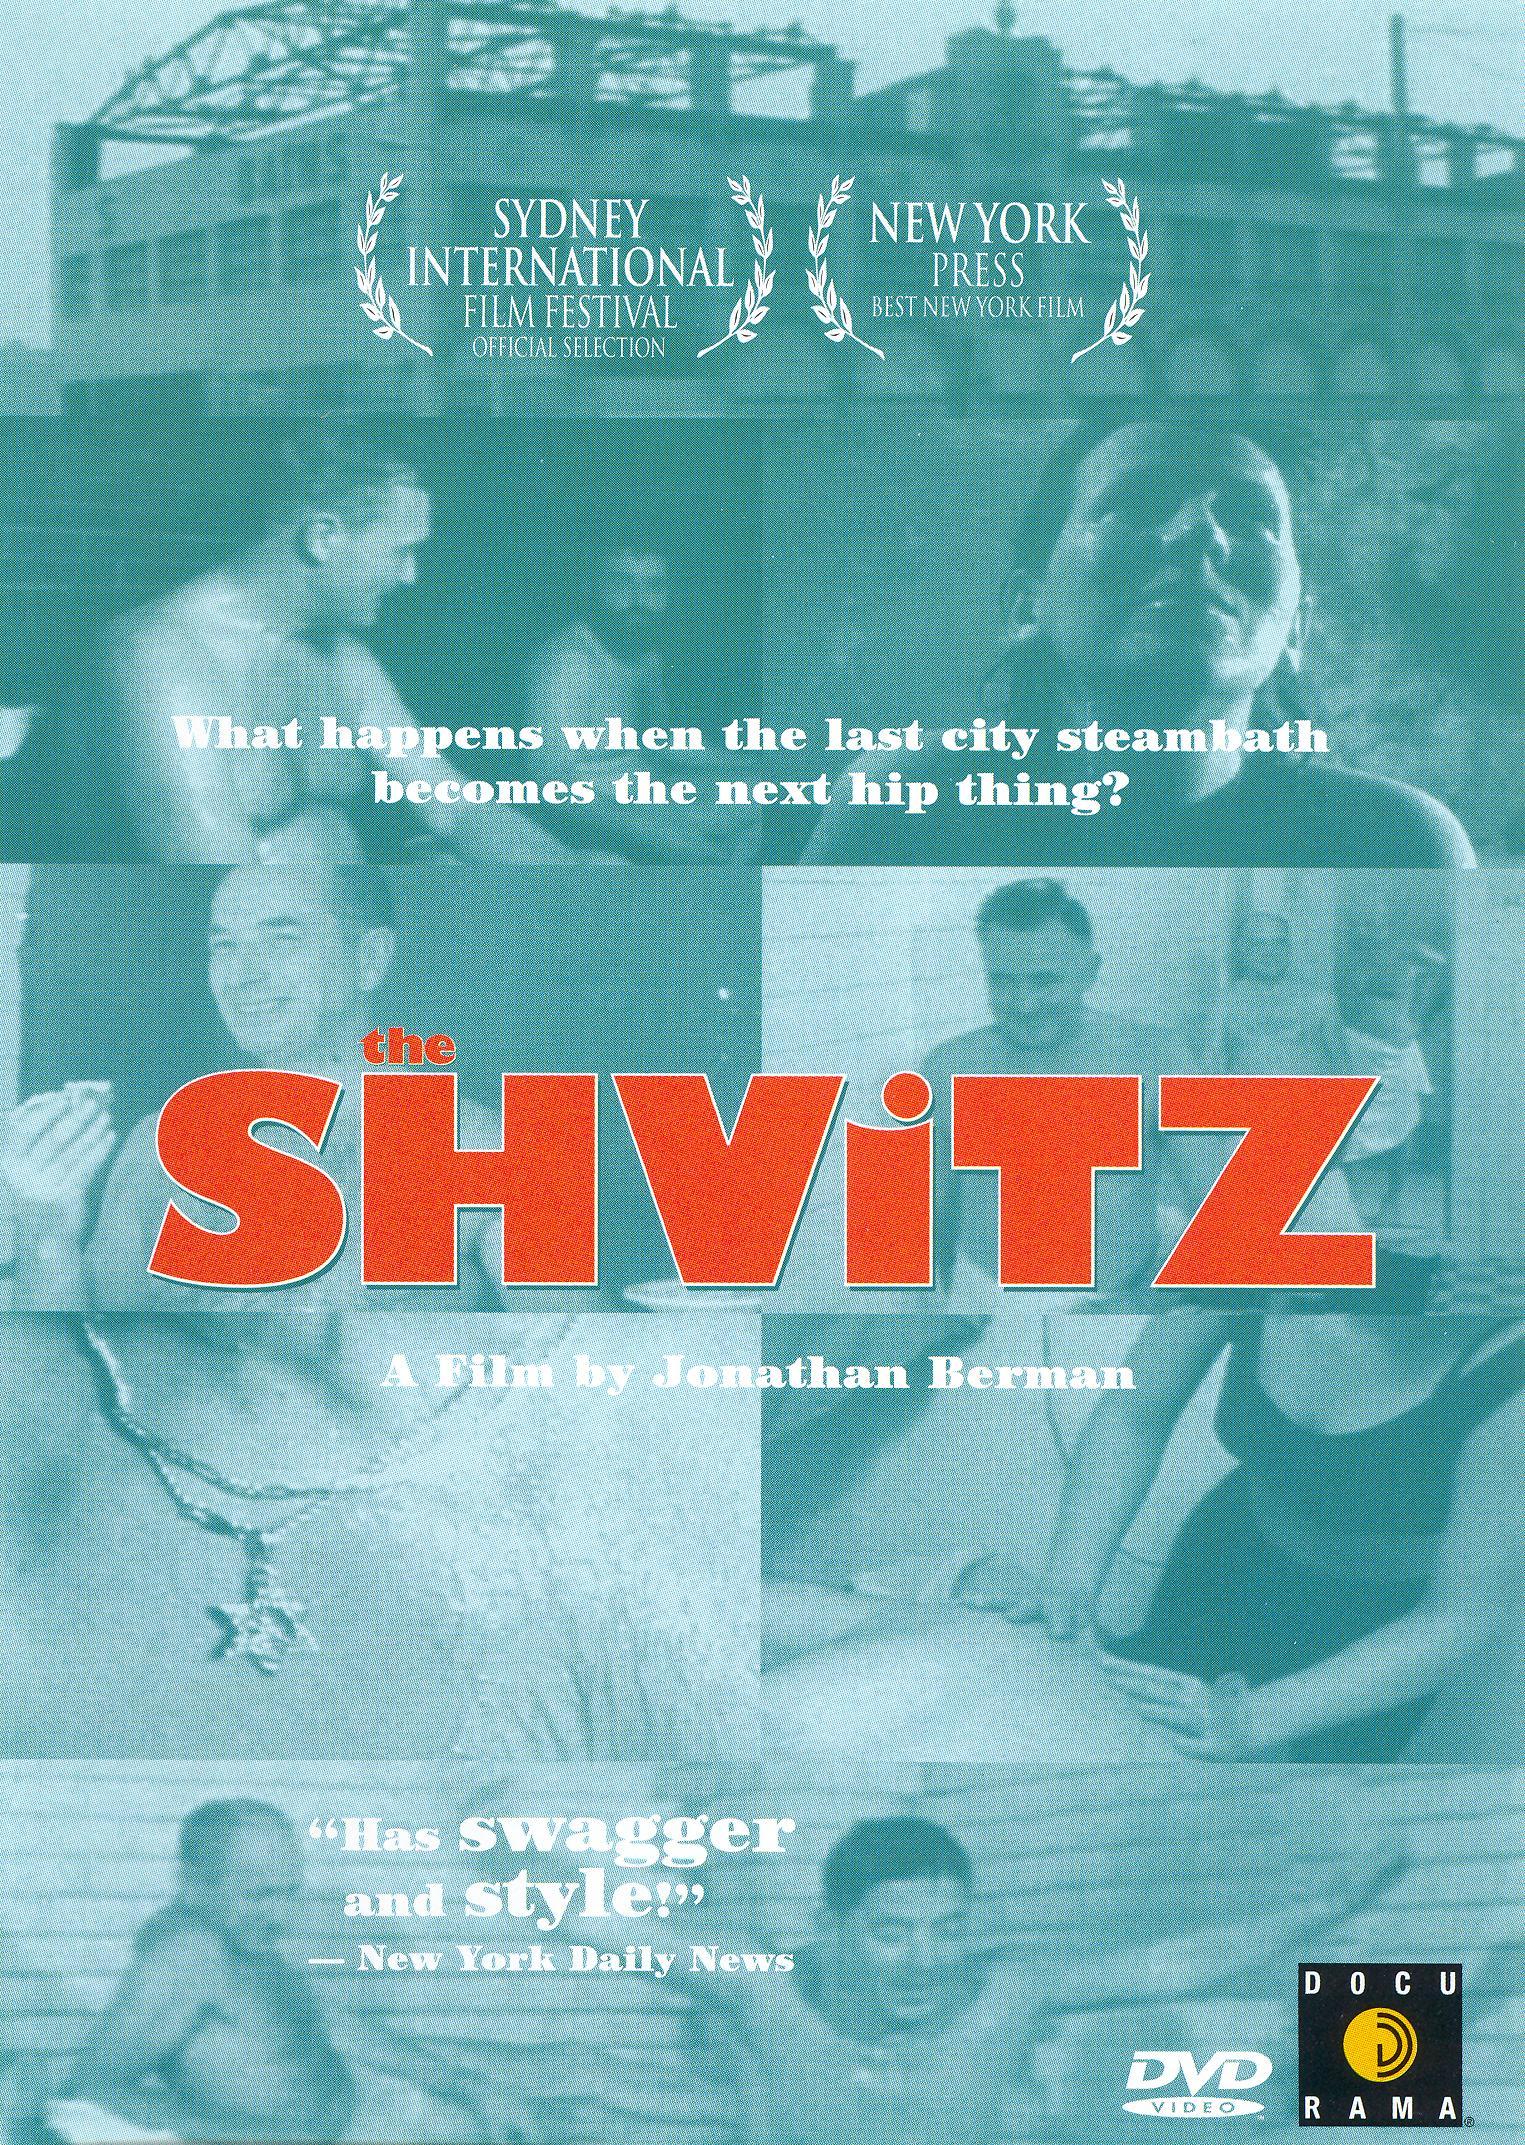 The Shvitz